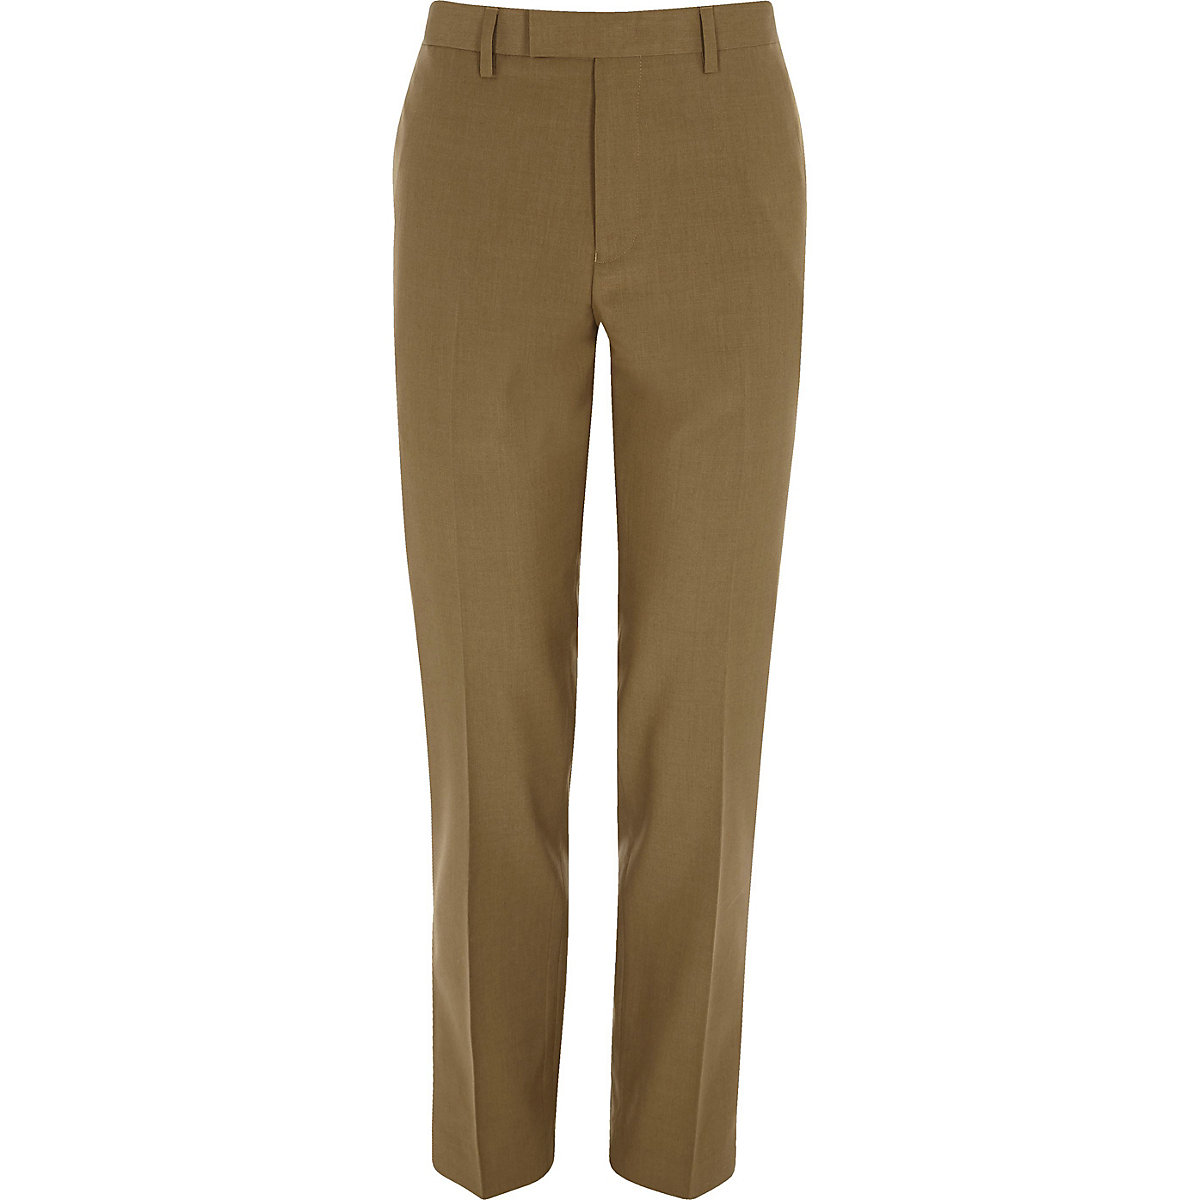 Brown slim fit suit trousers